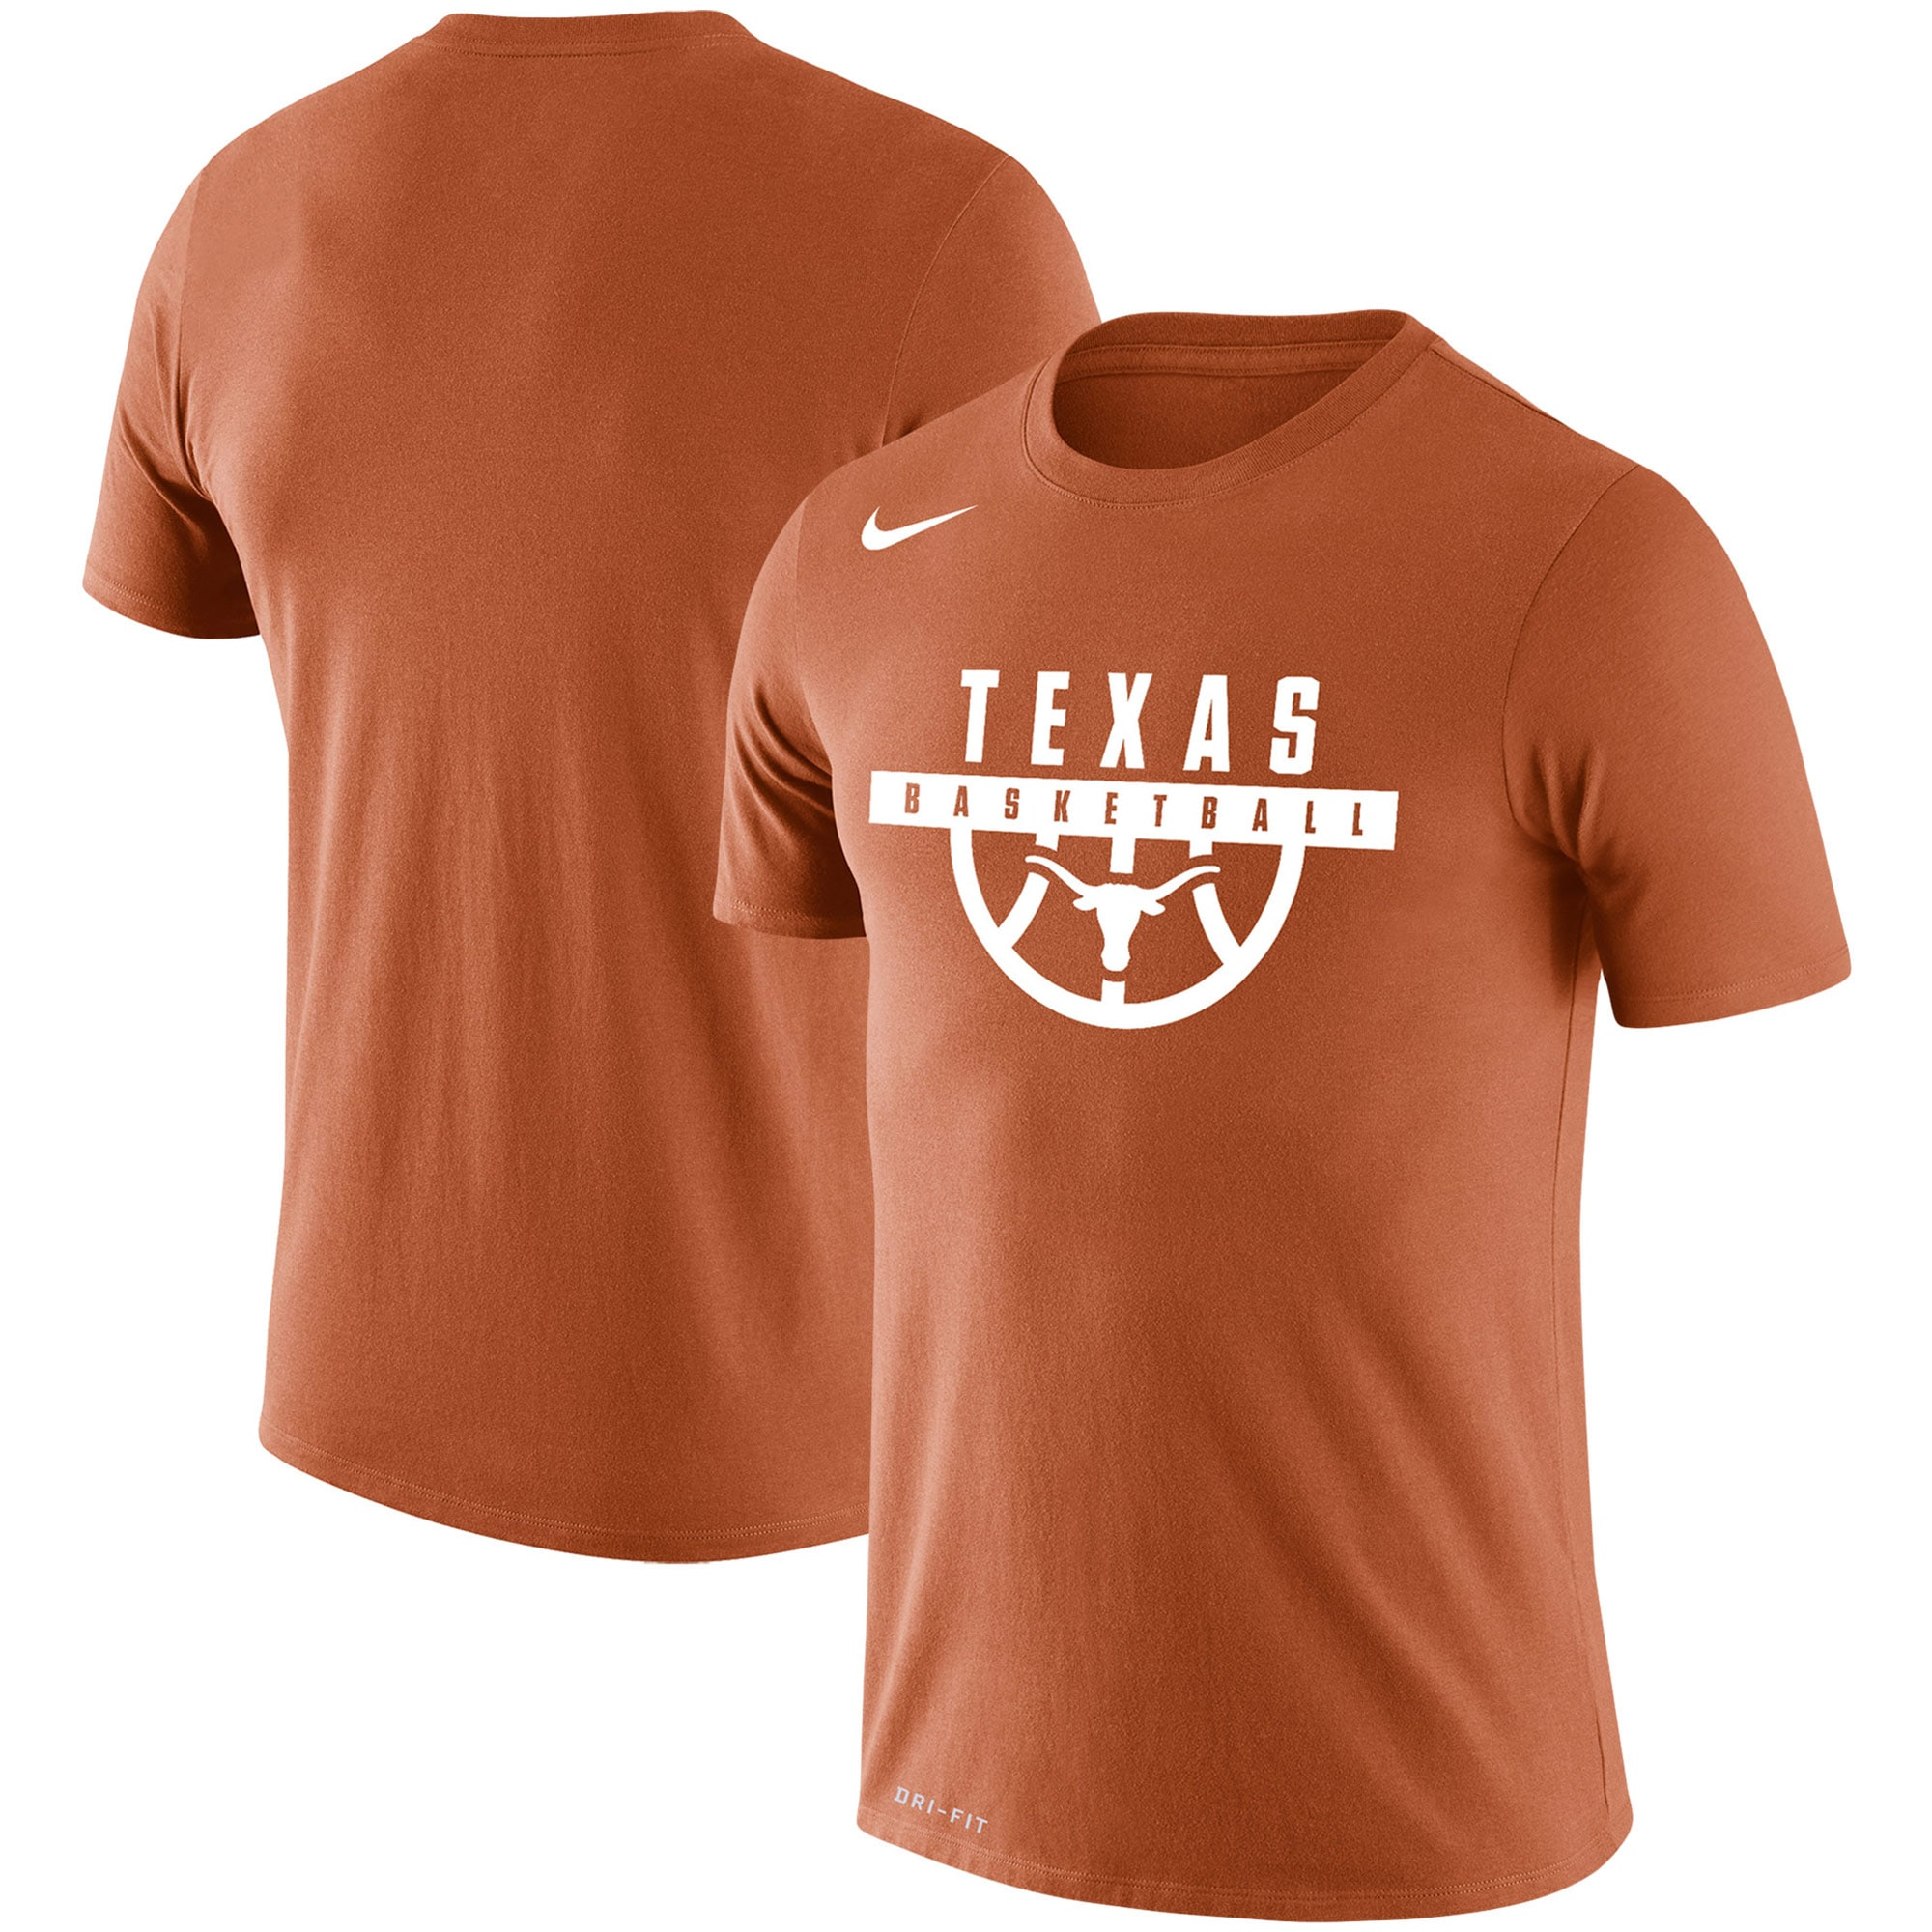 Texas Longhorns Nike Basketball Drop Legend Performance T-Shirt - Texas Orange